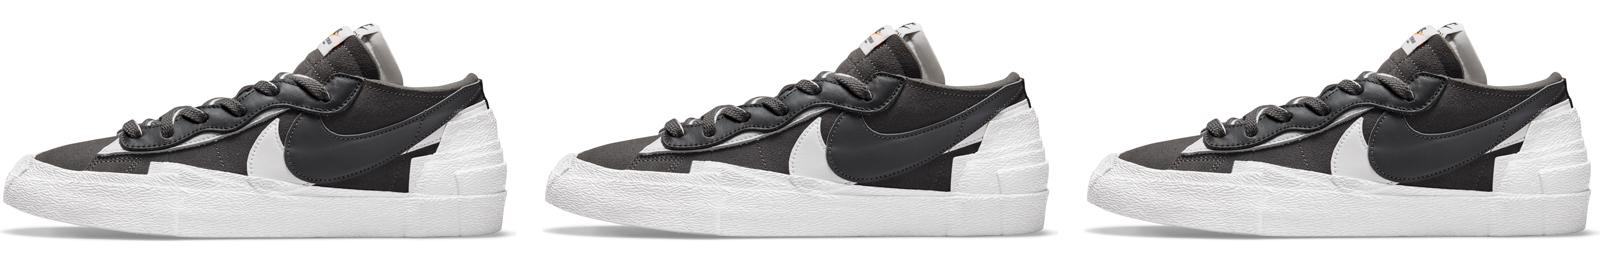 NikeLab DSM LA